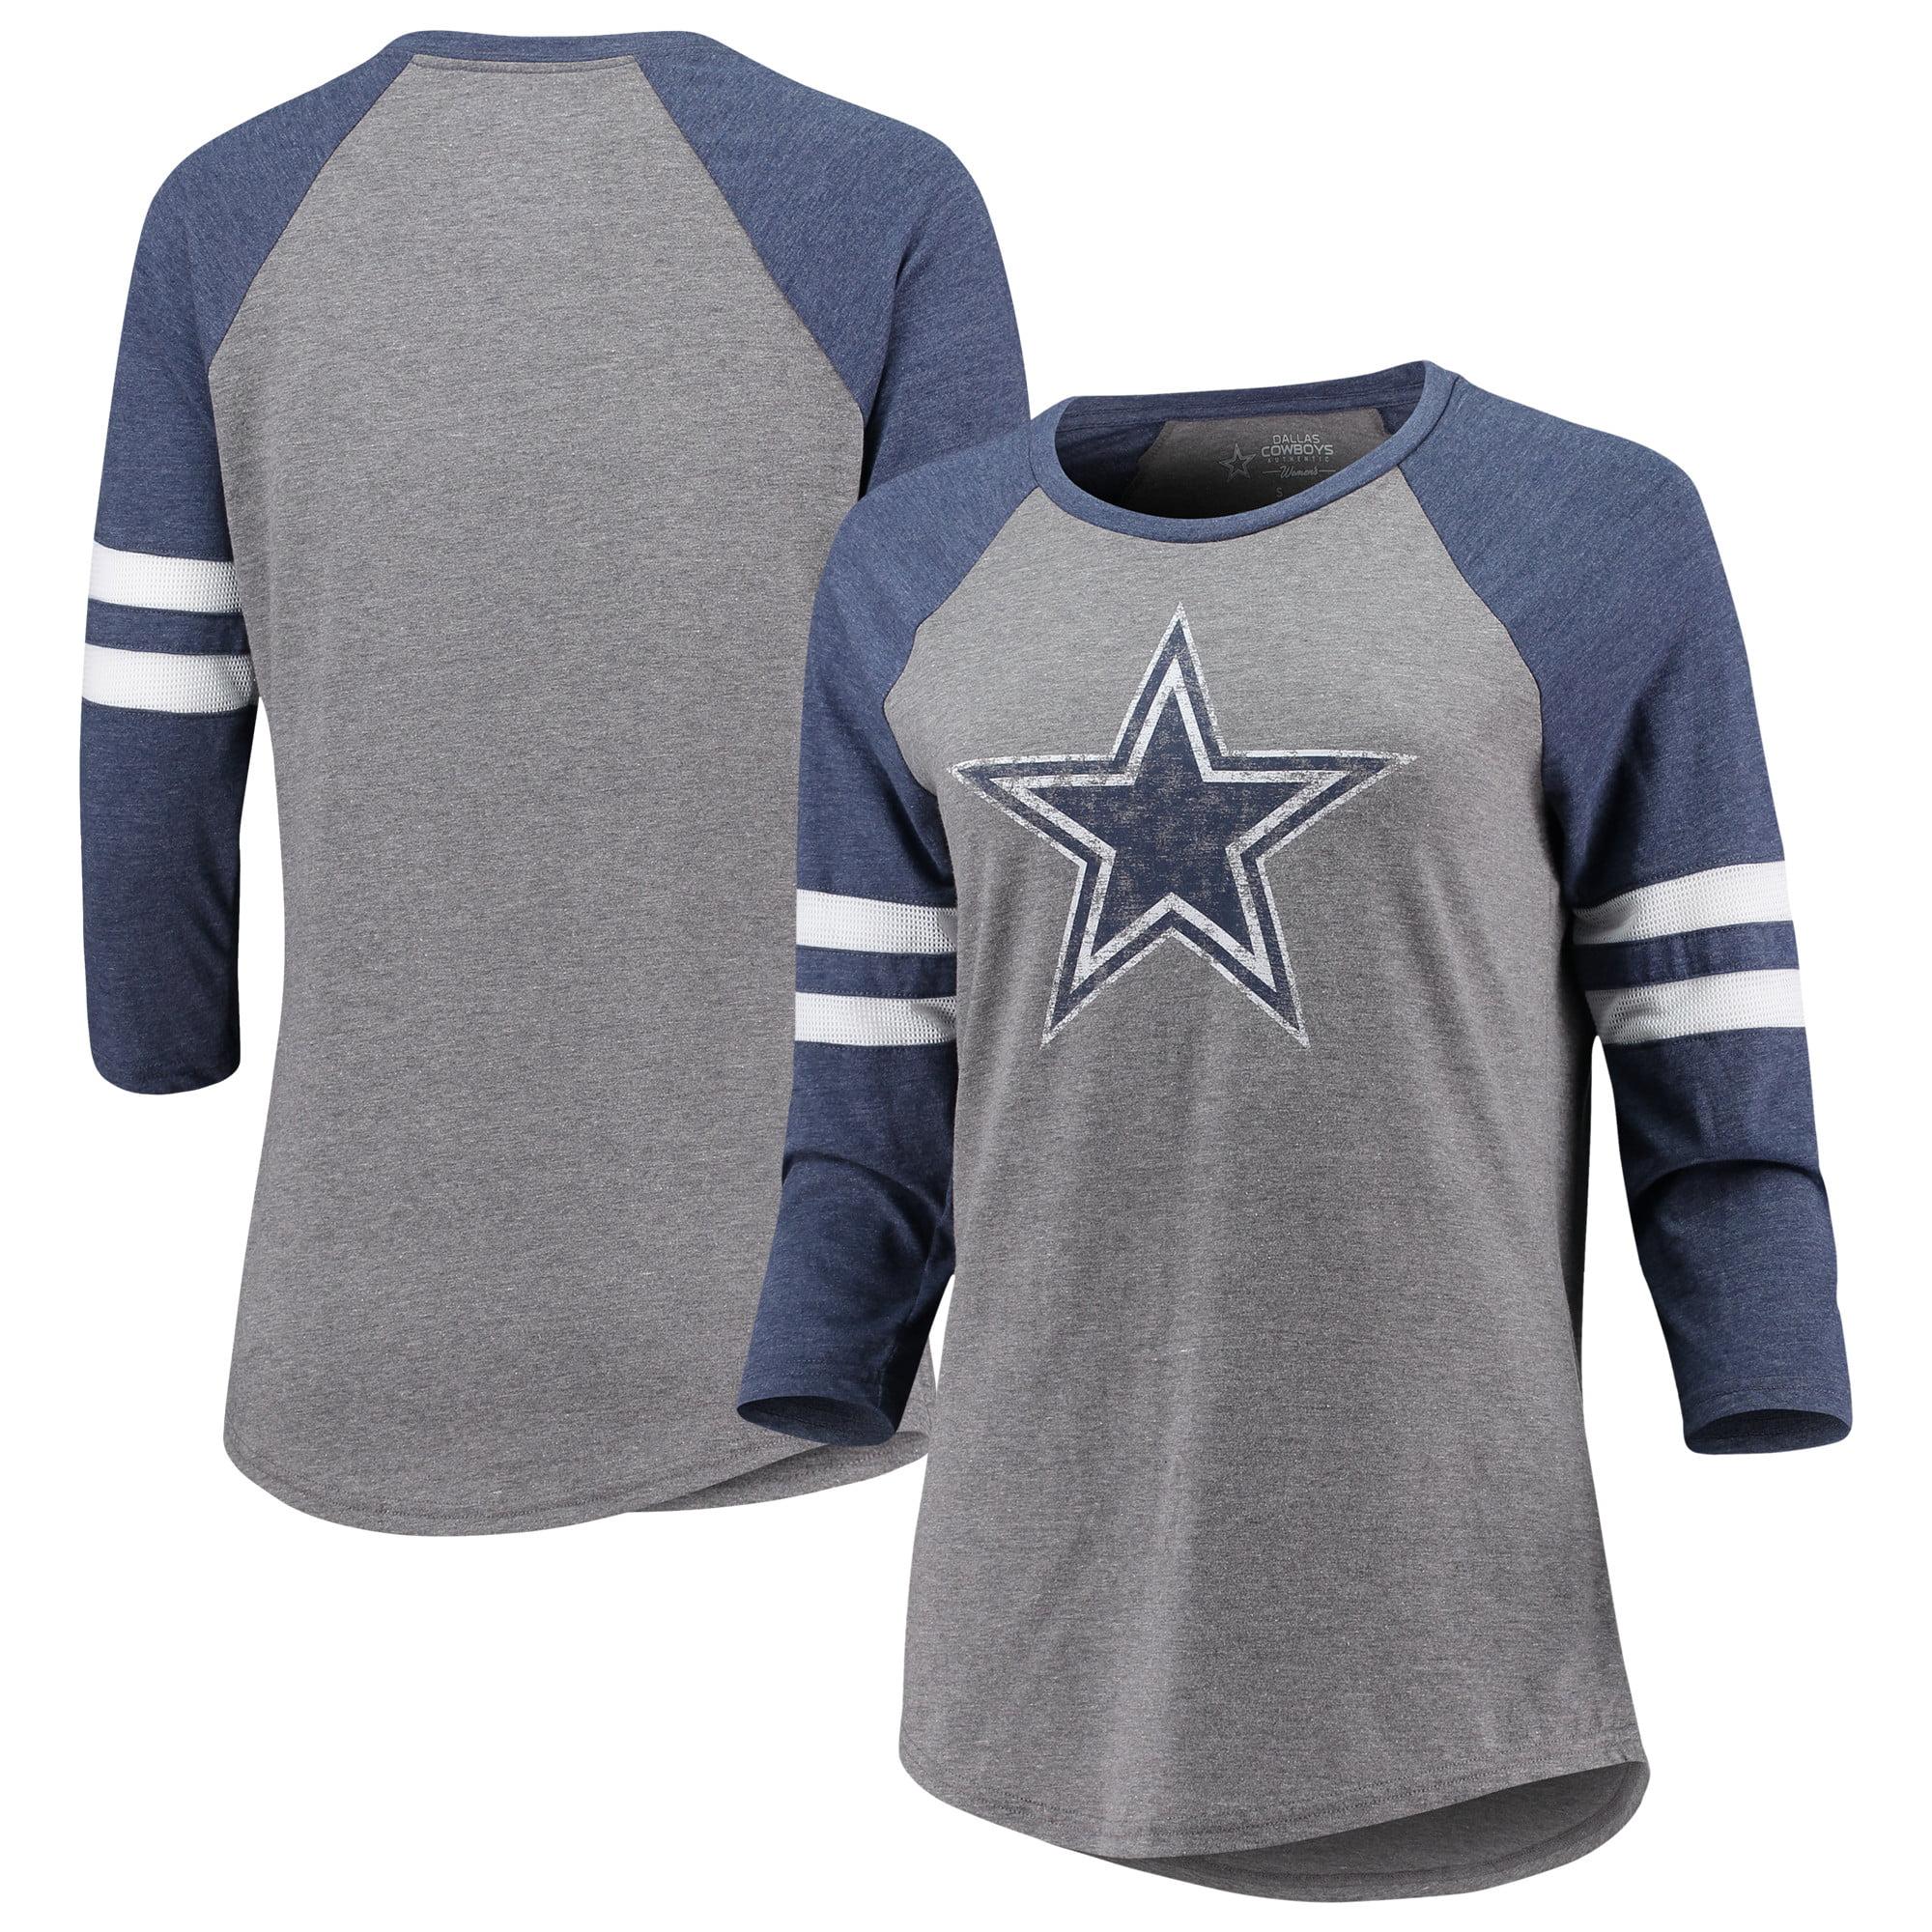 Dallas Cowboys Women's Simba Raglan Long Sleeve T-Shirt - Heathered Gray/Heathered Navy